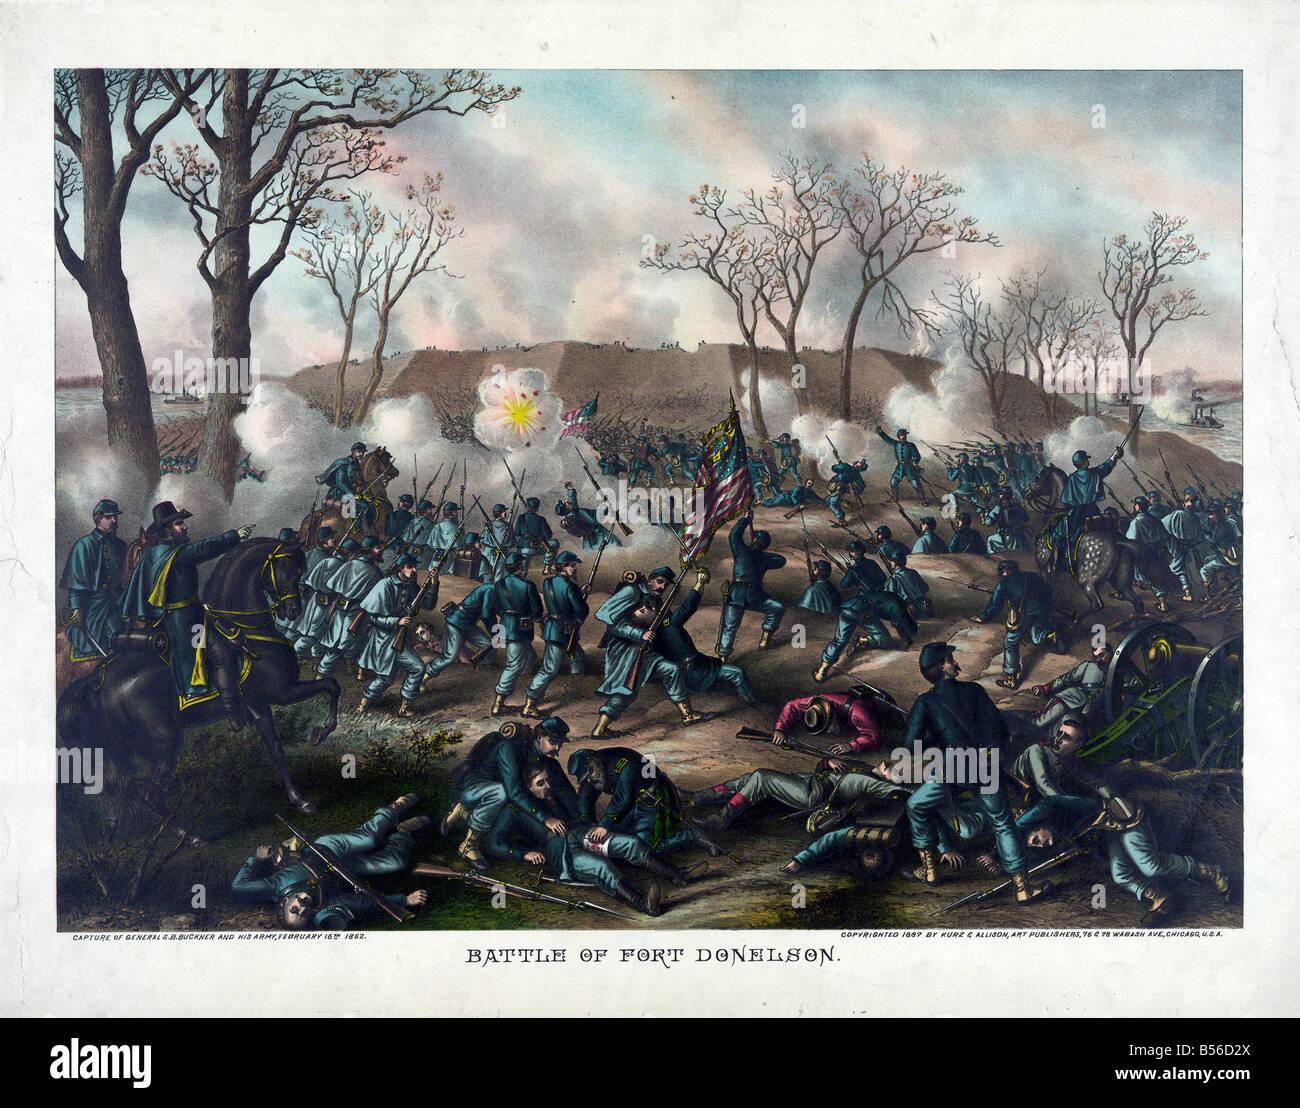 Battle of Fort Donelson - Civil War - Stock Image